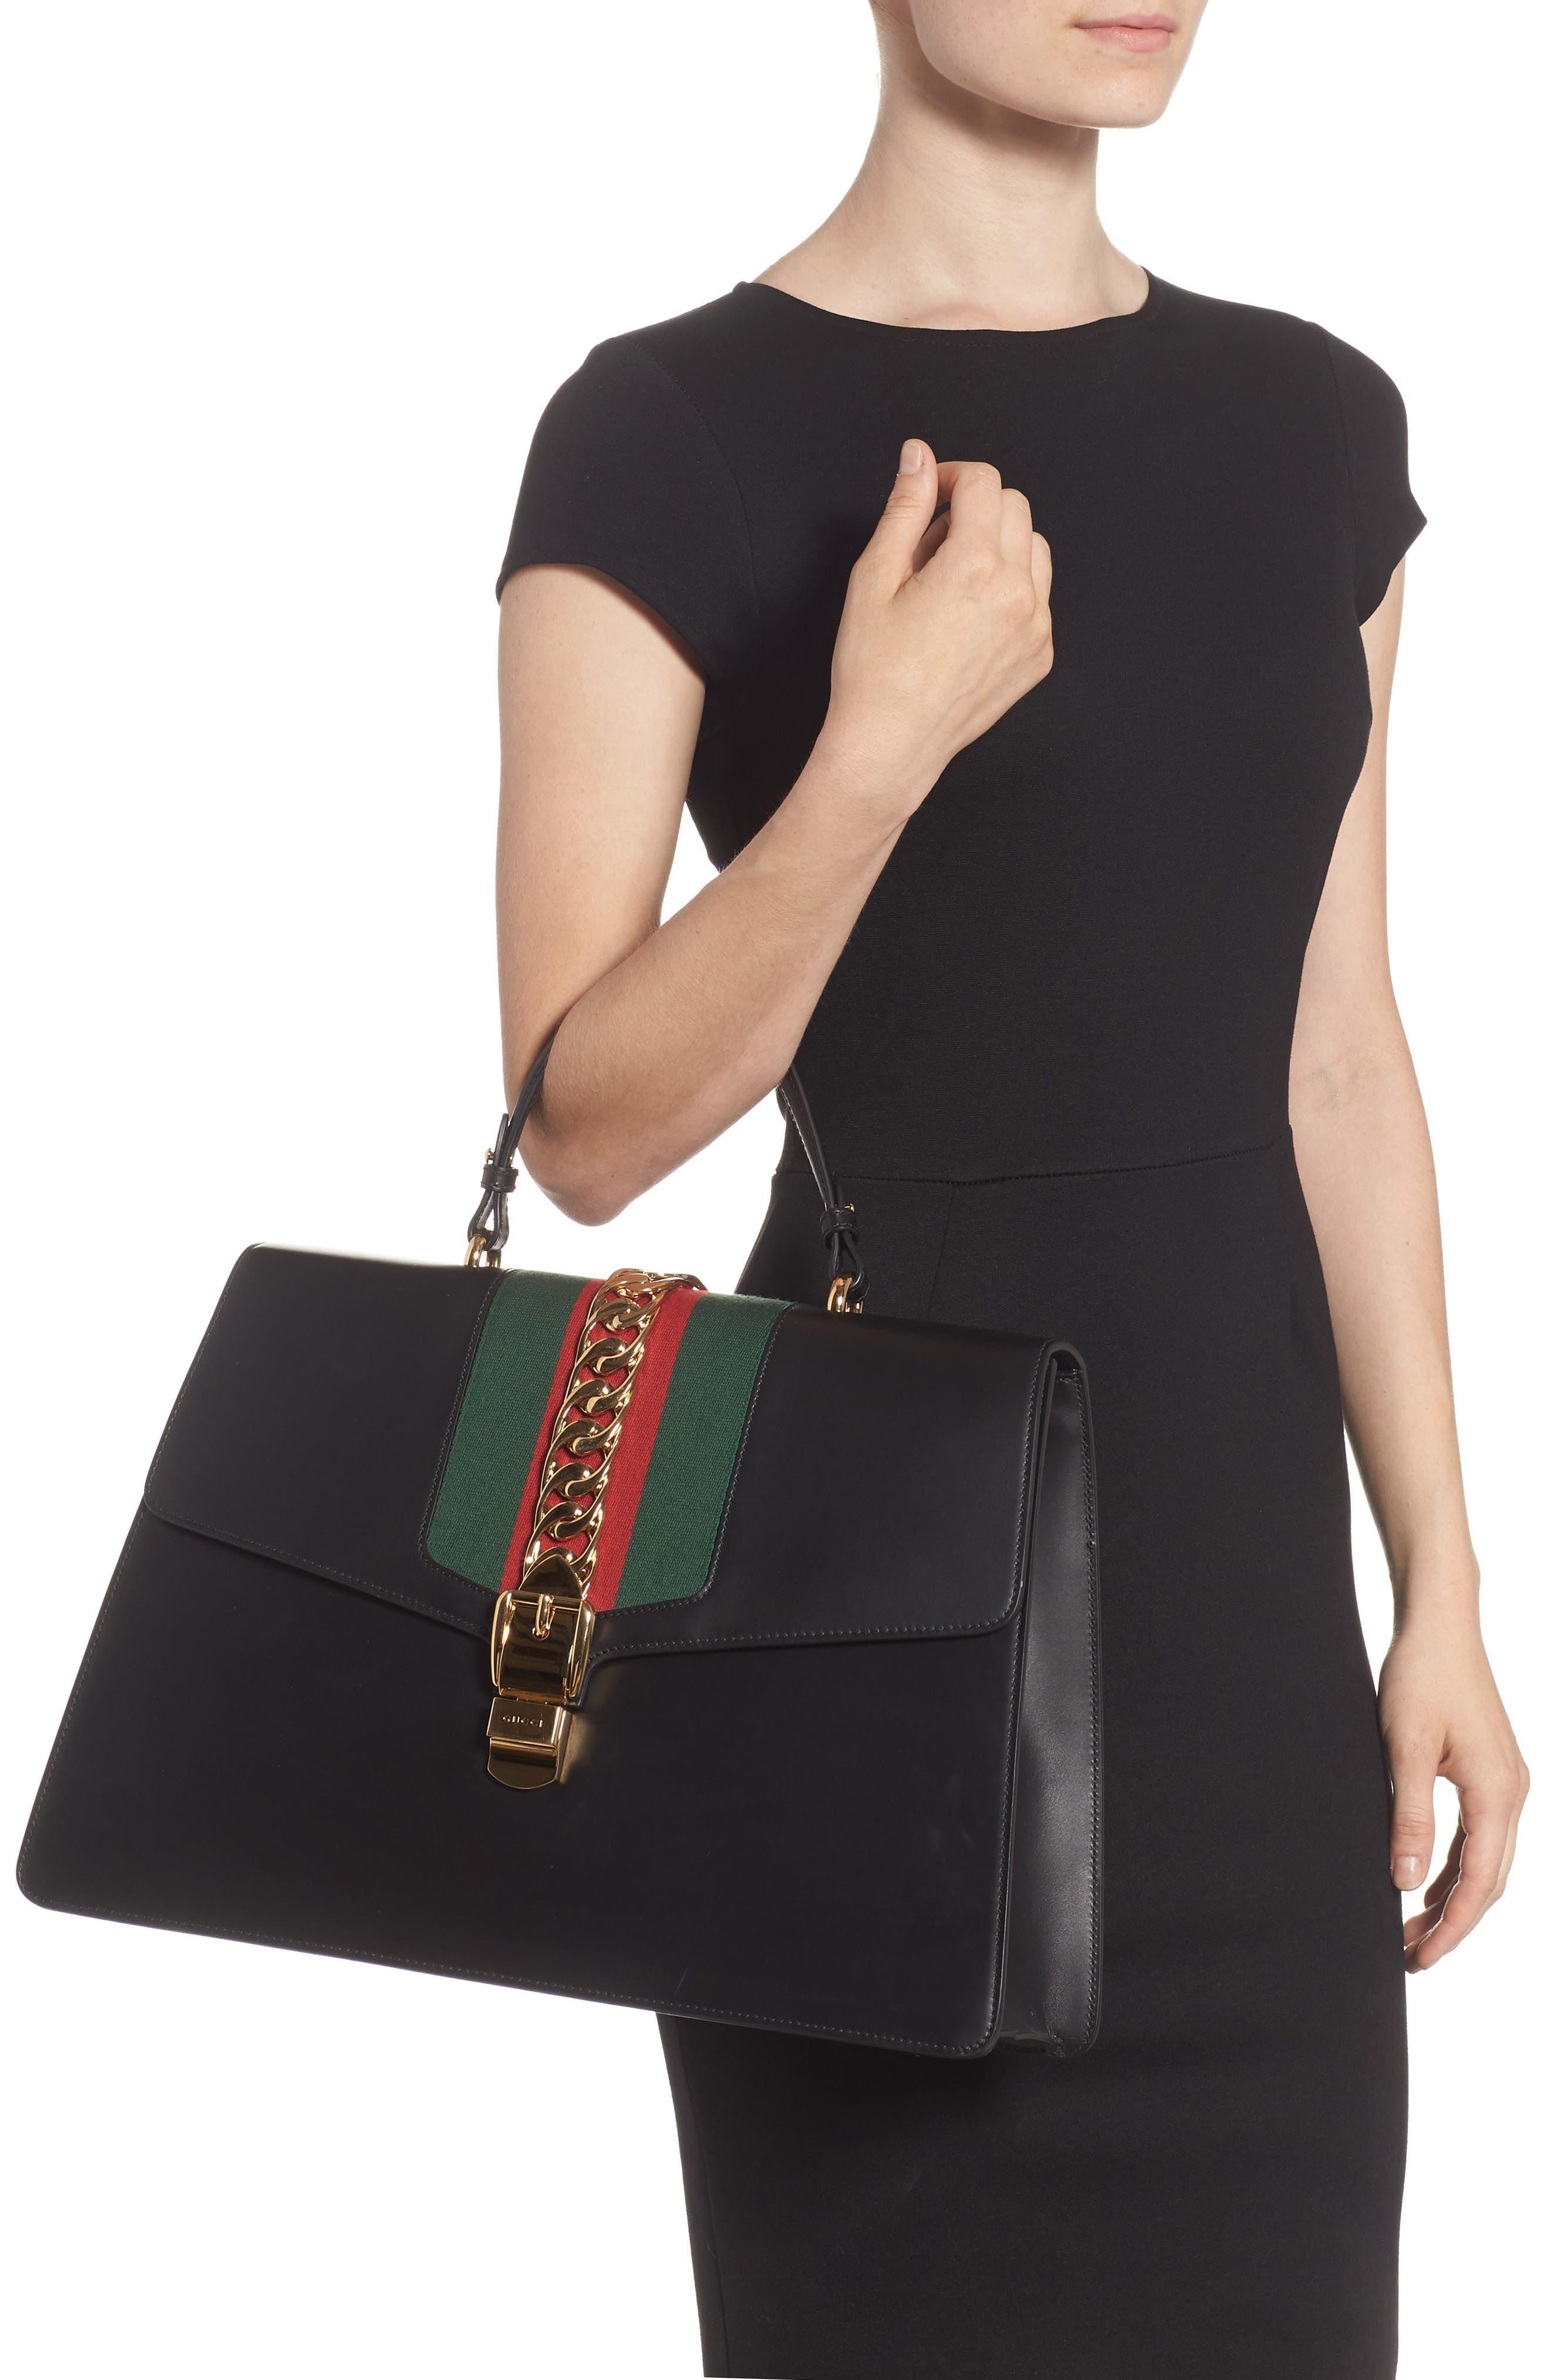 Maxi Sylvie Top Handle Leather Shoulder Bag,                             Alternate thumbnail 2, color,                             NERO/ VERT RED